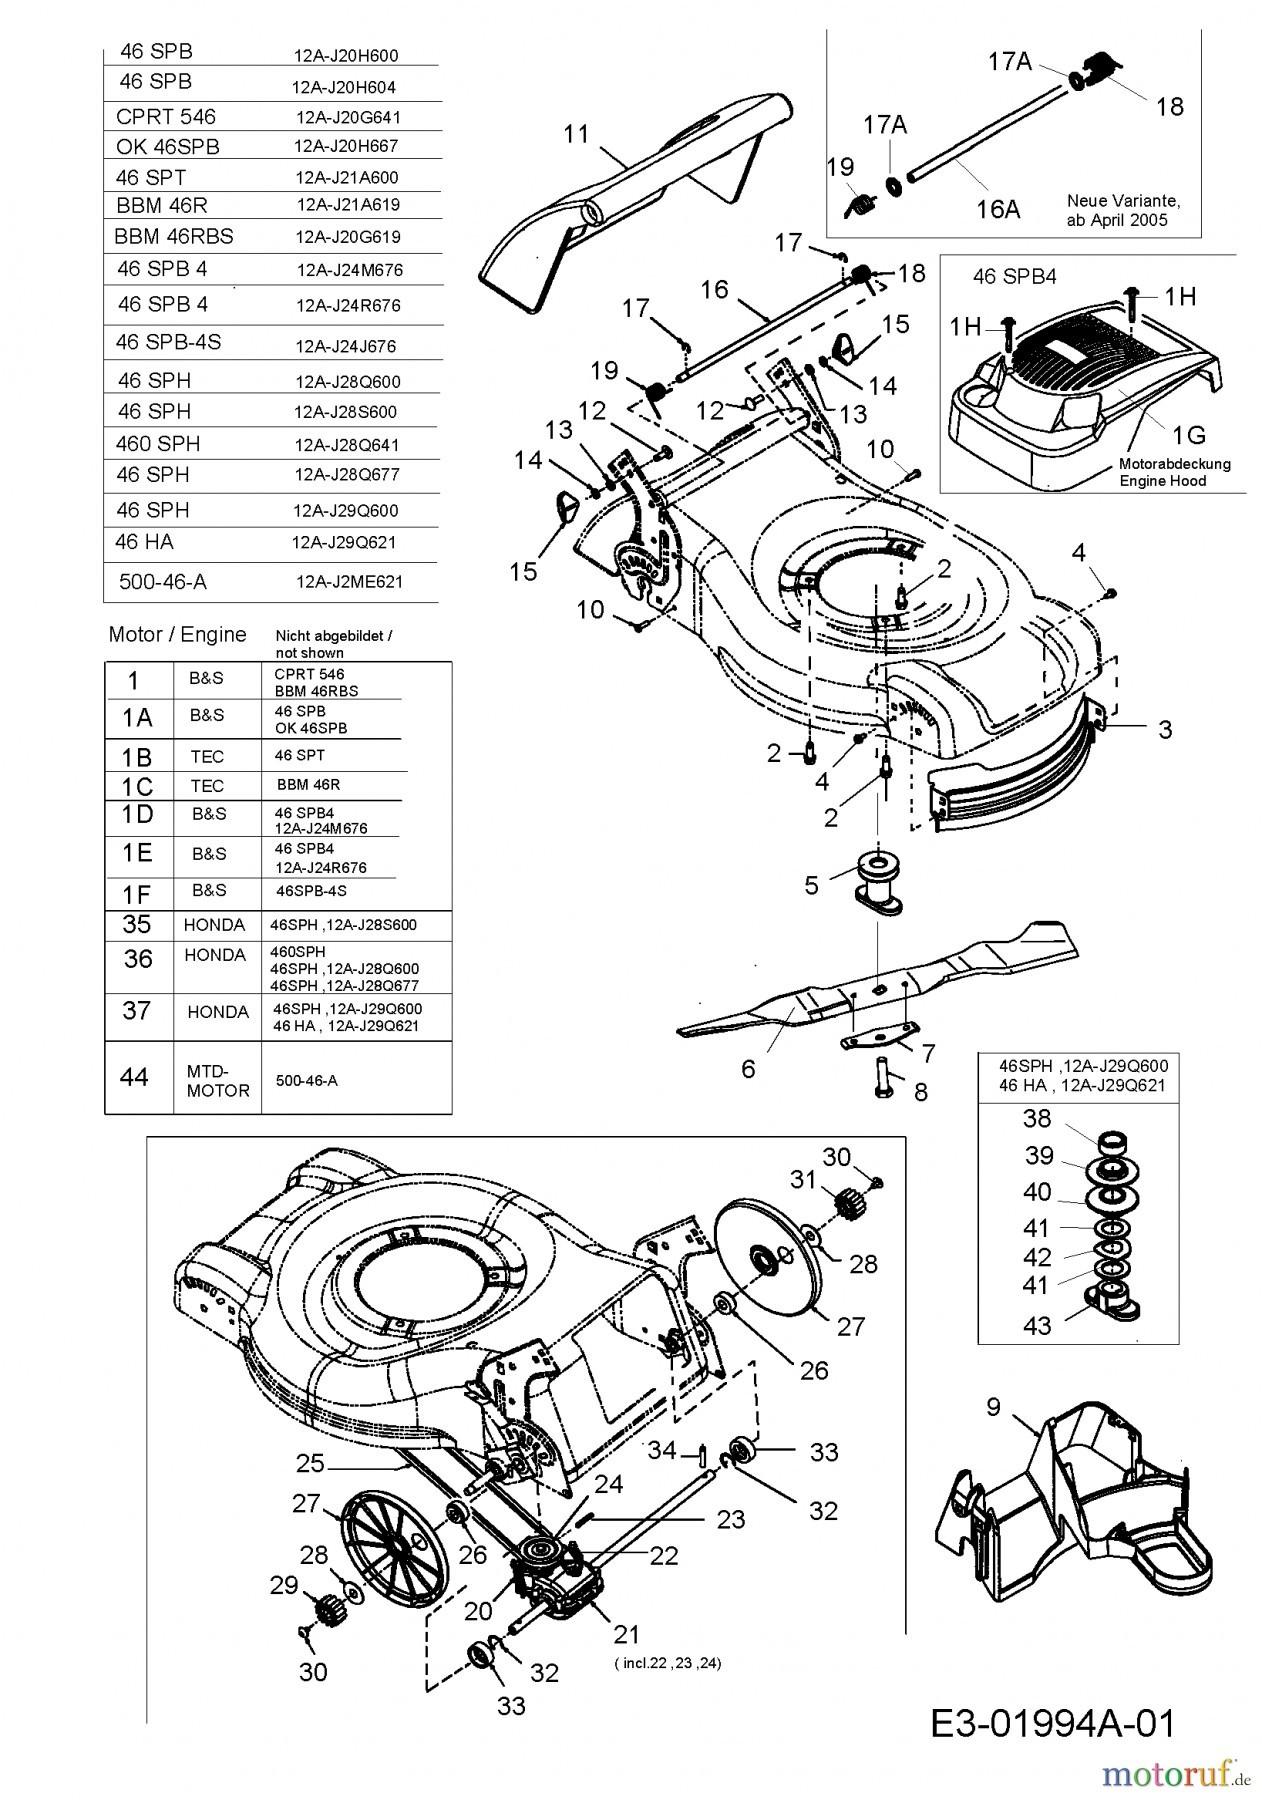 Honda Civic Exhaust System Diagram